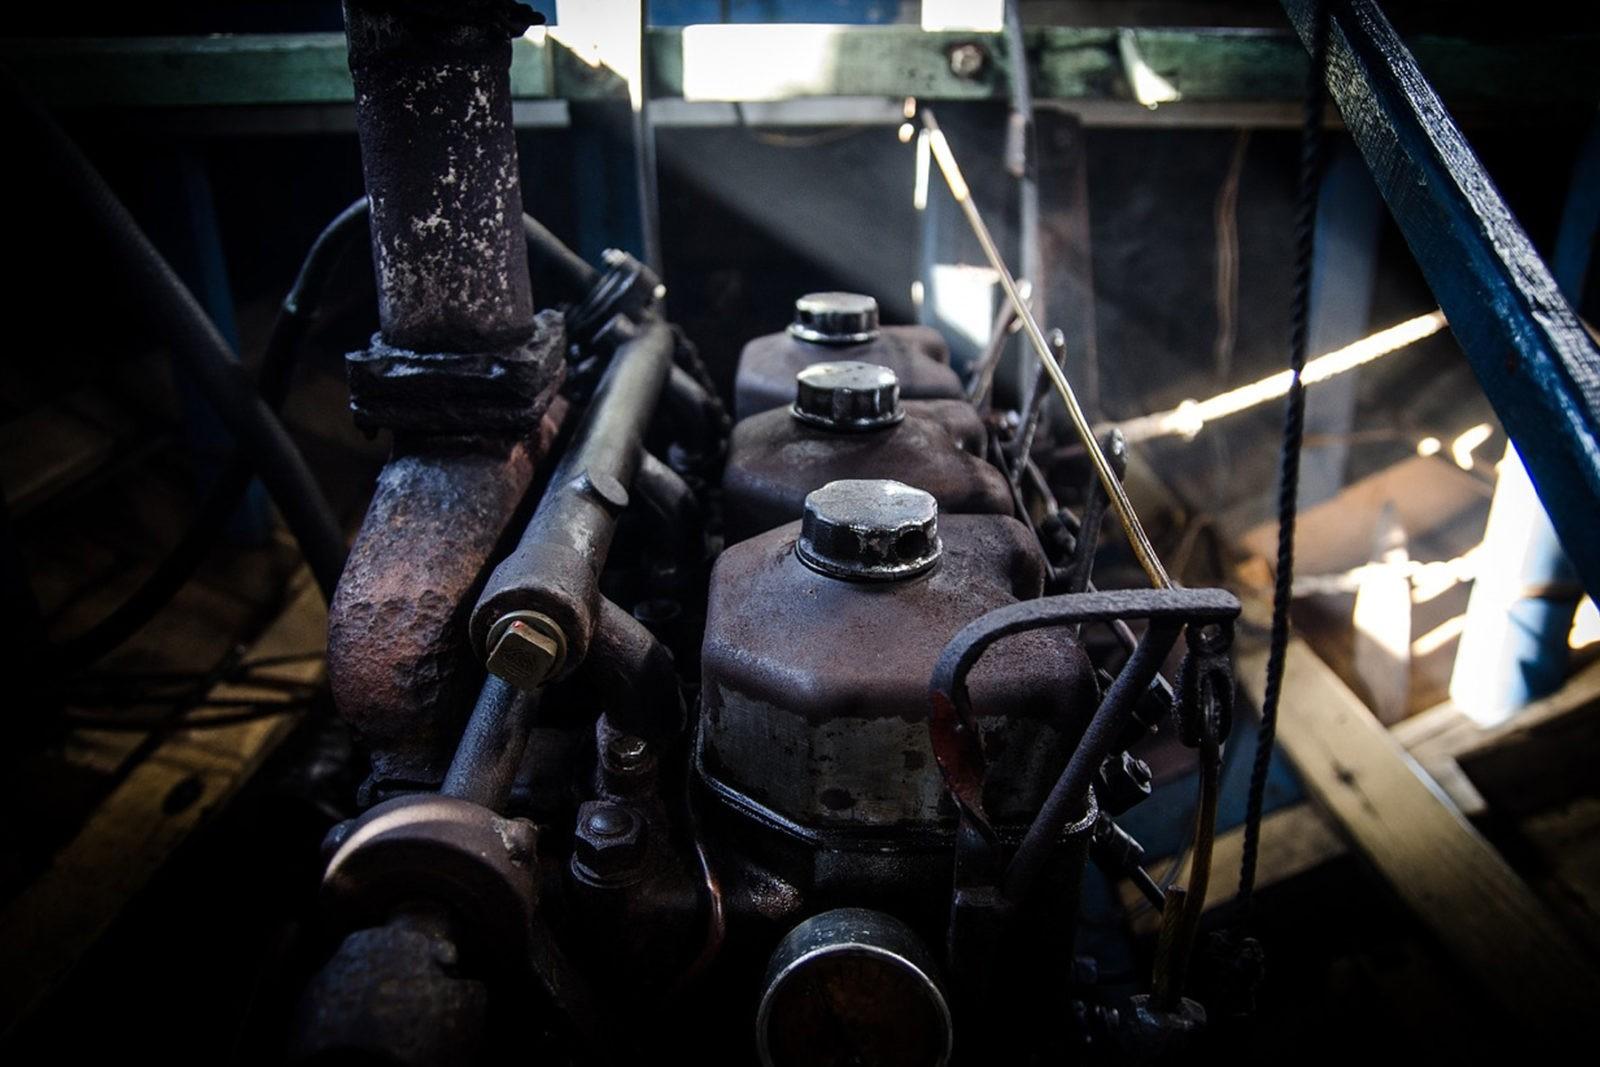 Hvordan skifter jeg olie på bådmotoren?